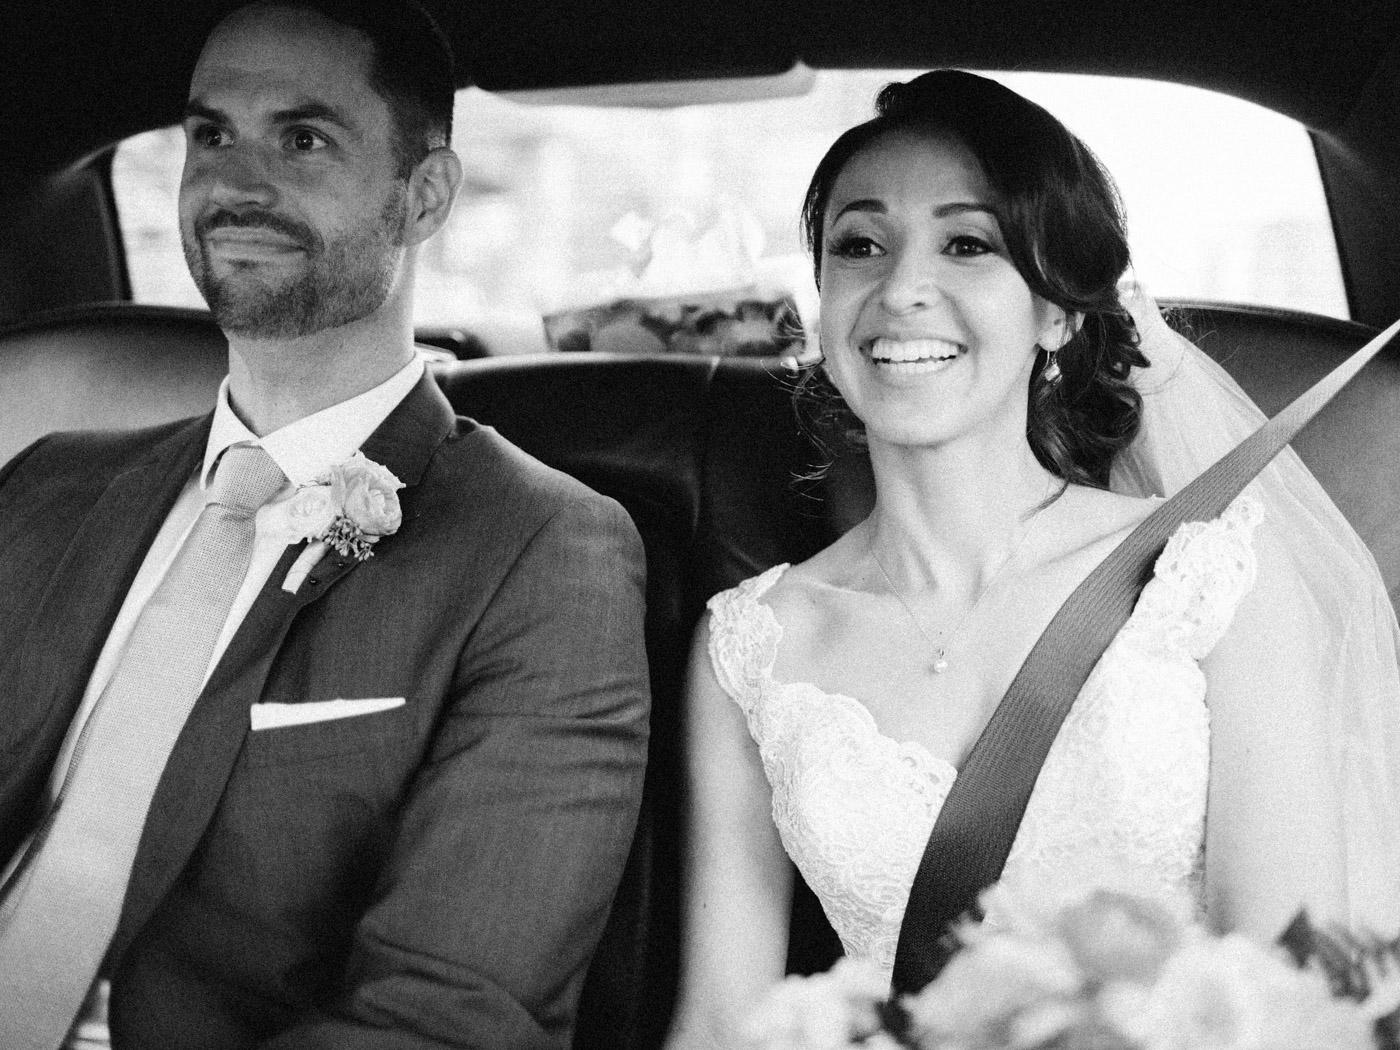 toronto_wedding_photographer_fine_art_documentary-307.jpg